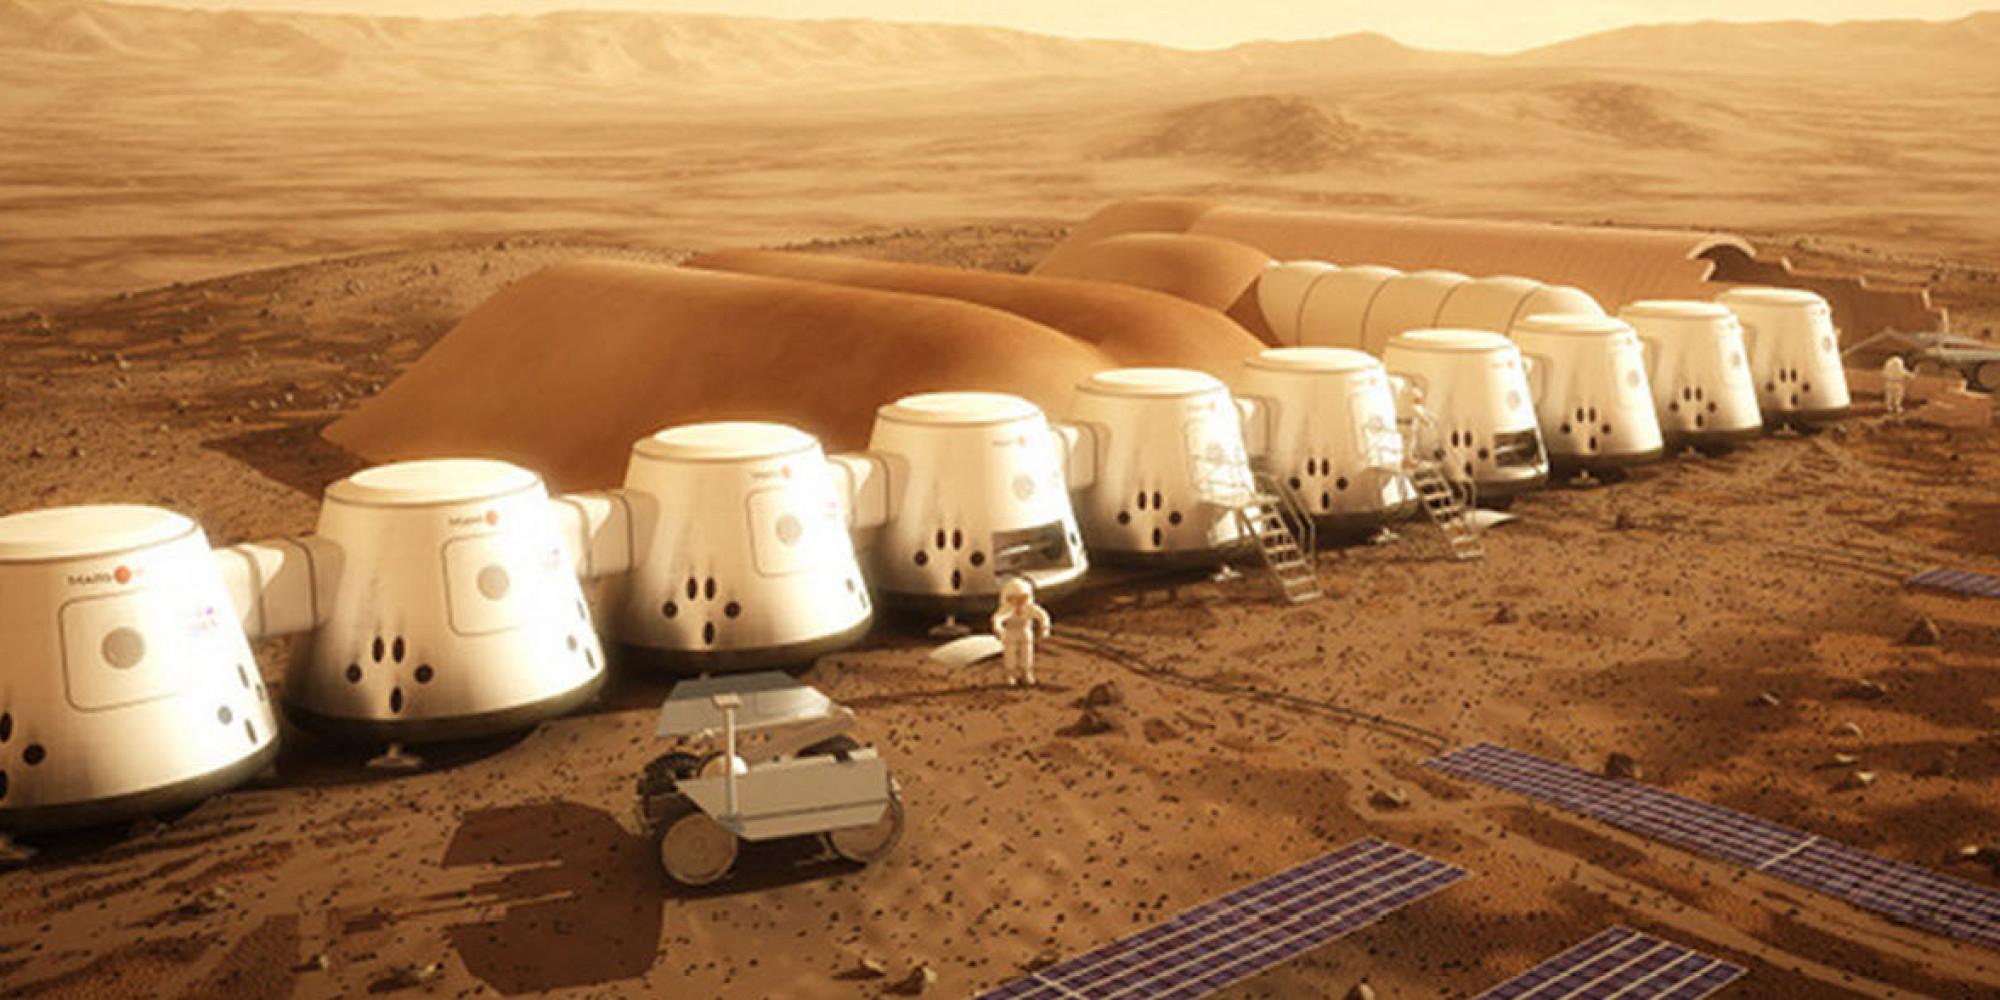 Sean Penn ira sur Mars pour Hulu en 2018 — The First